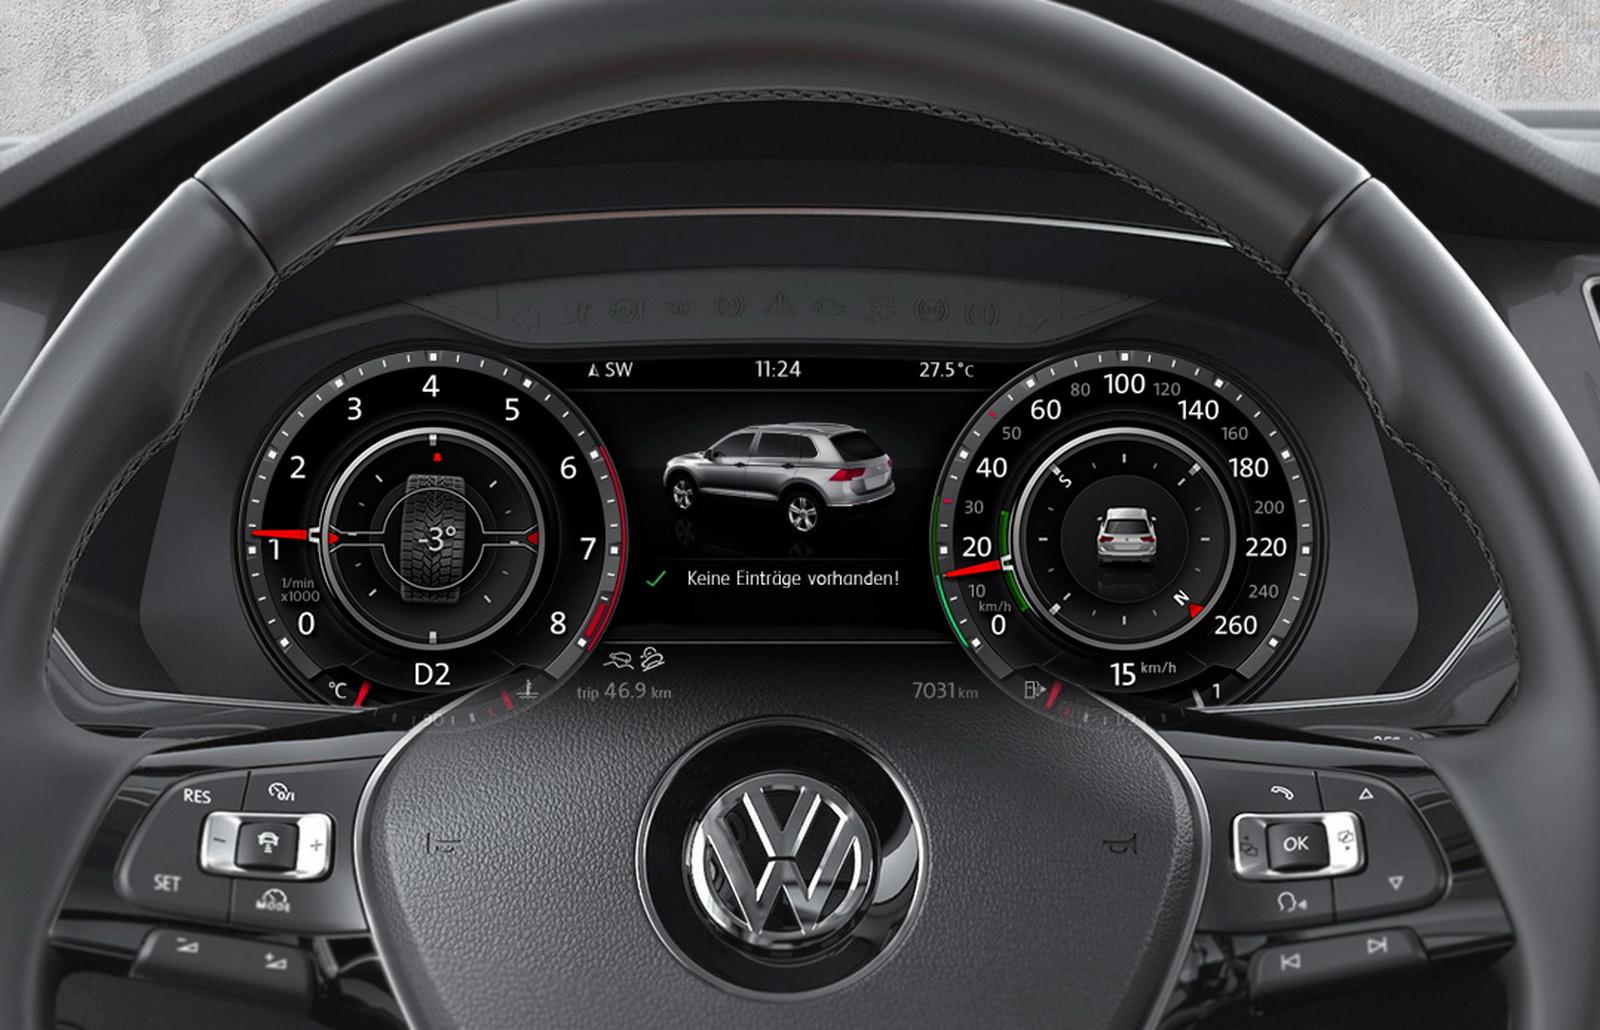 Приборная панель Volkswagen Tiguan